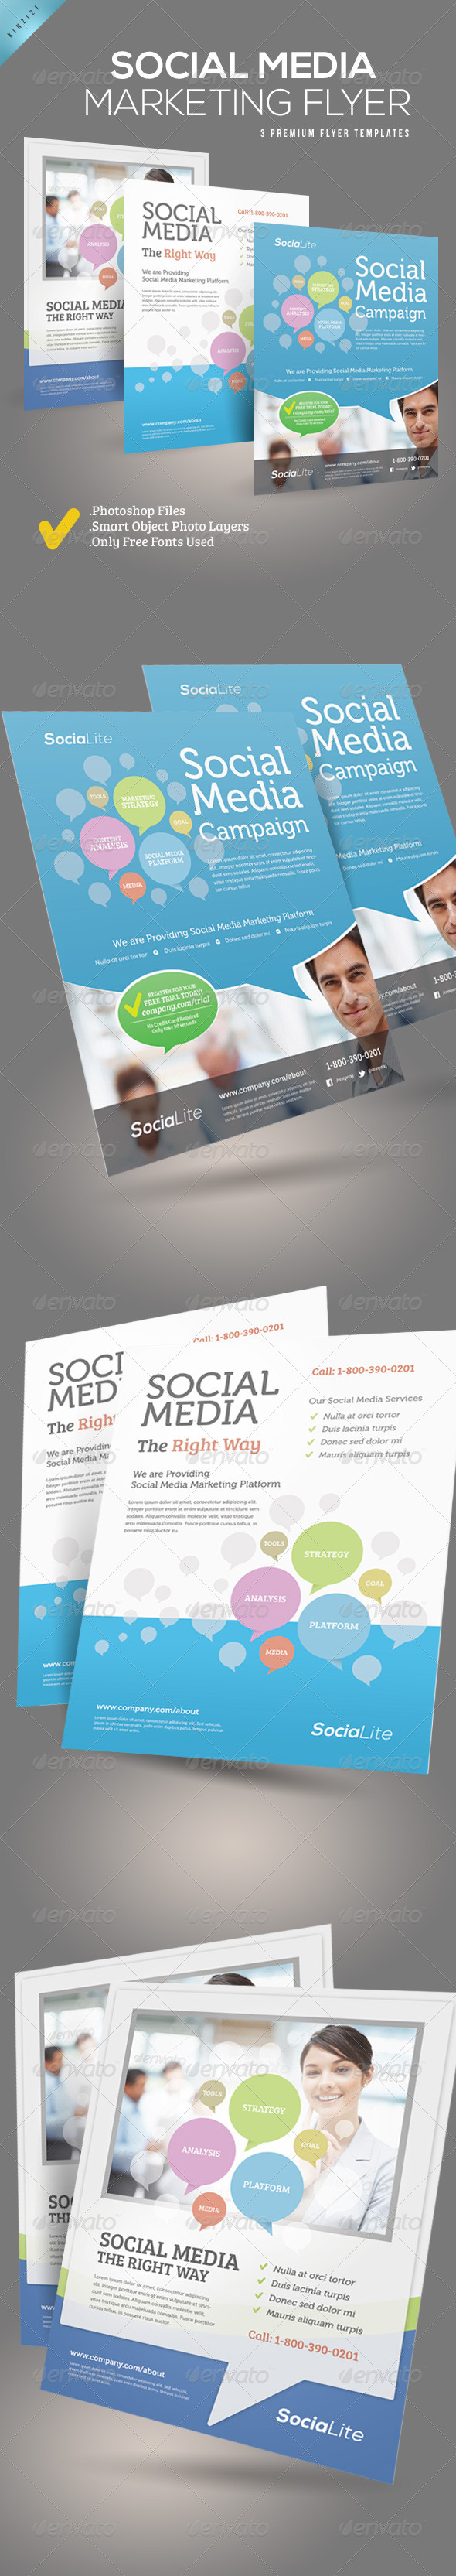 GraphicRiver Social Media Marketing Flyer 3358452